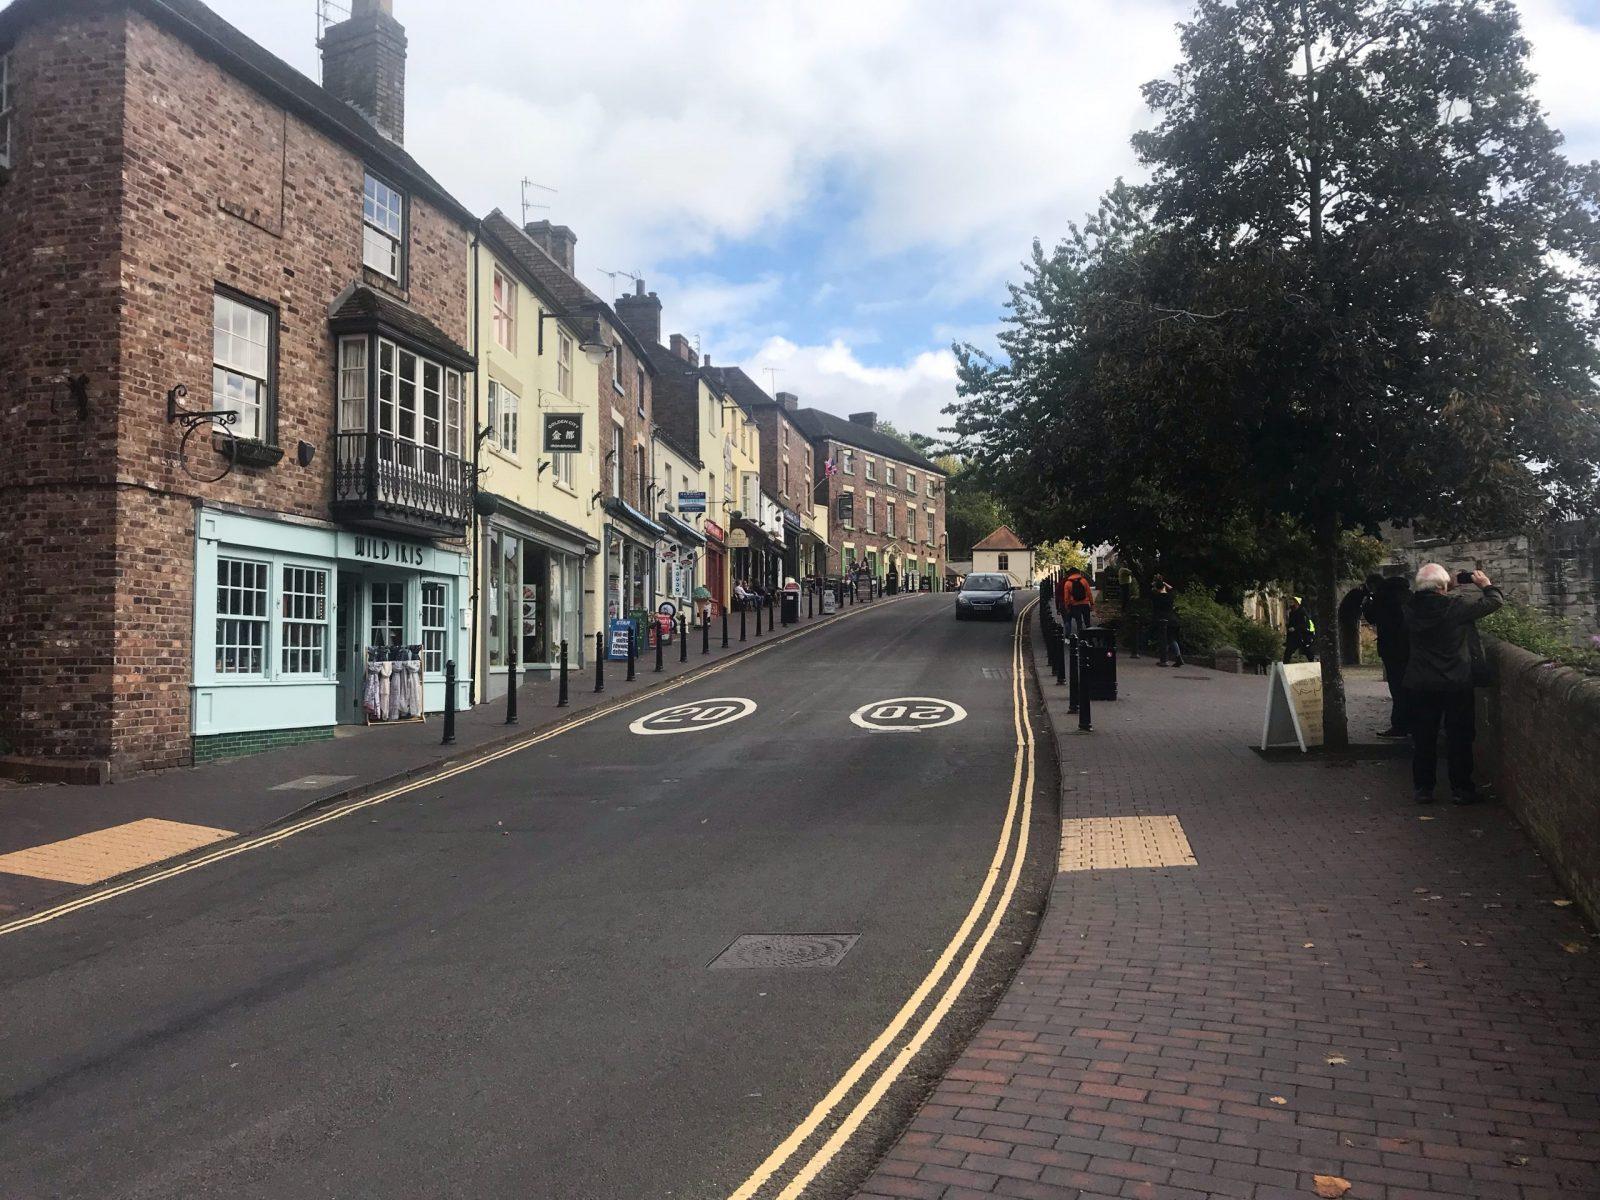 Visiting Ironbridge town centre